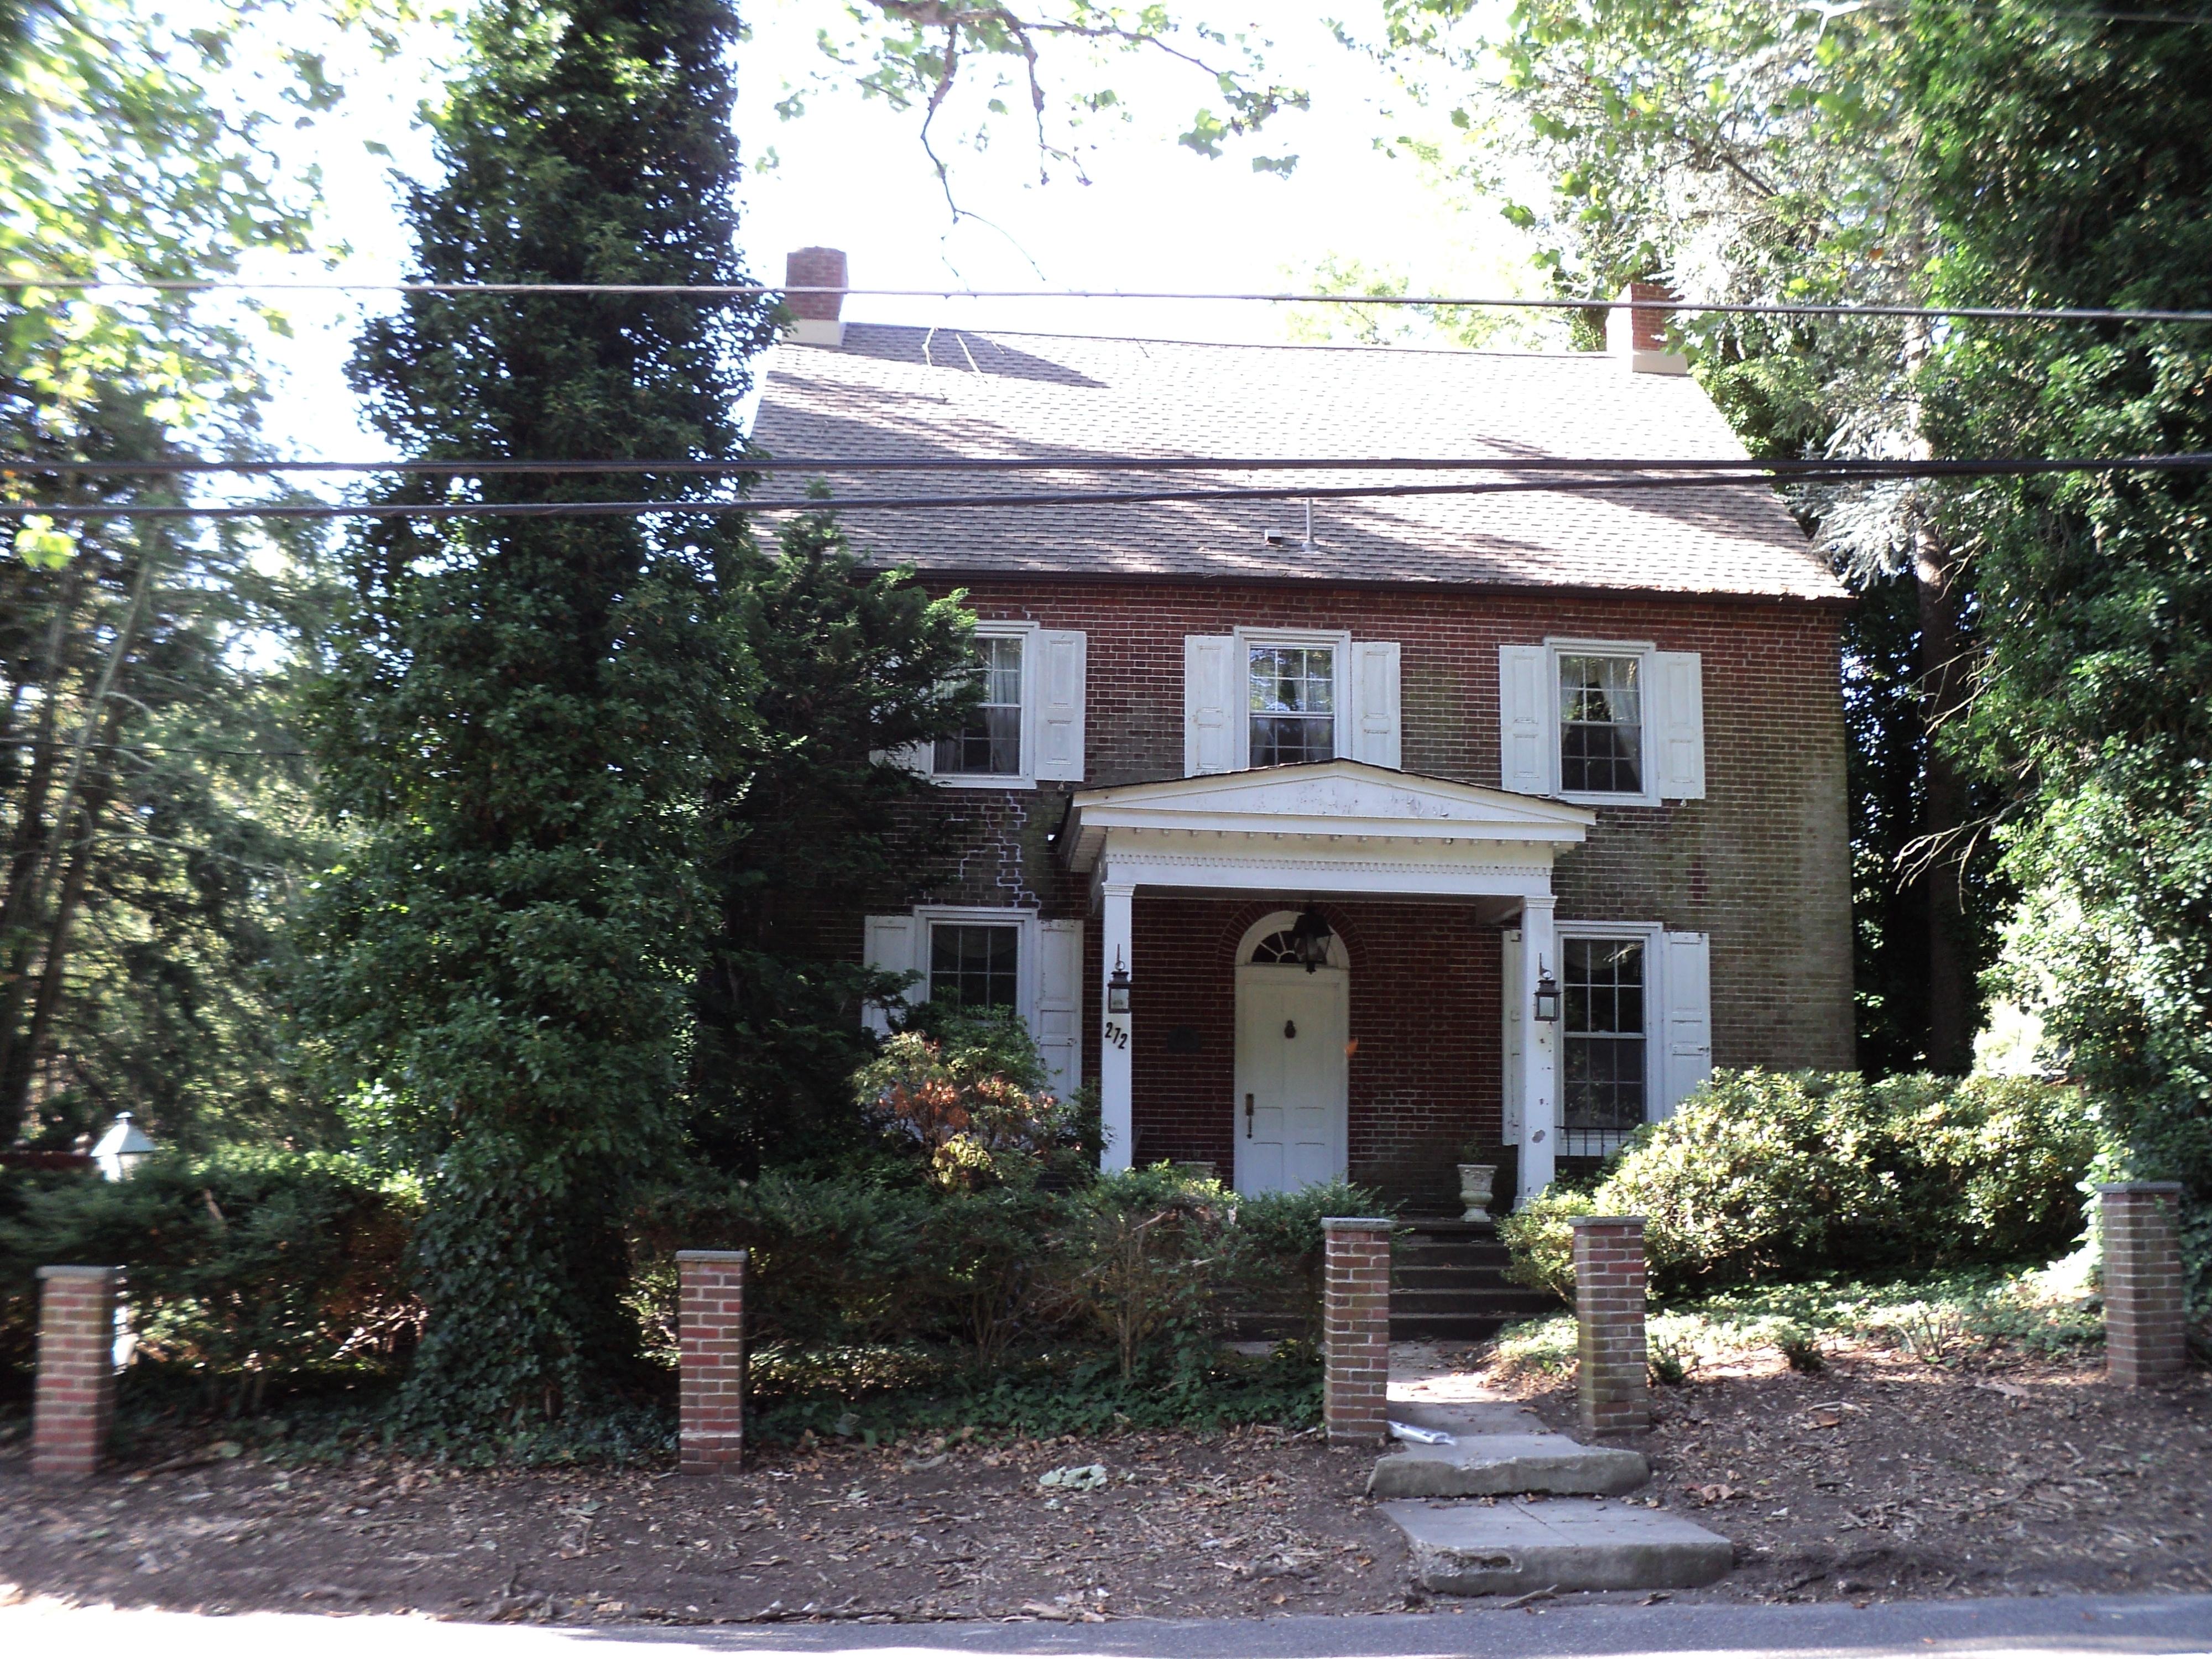 Miller's House (The Nehemiah Haines House)